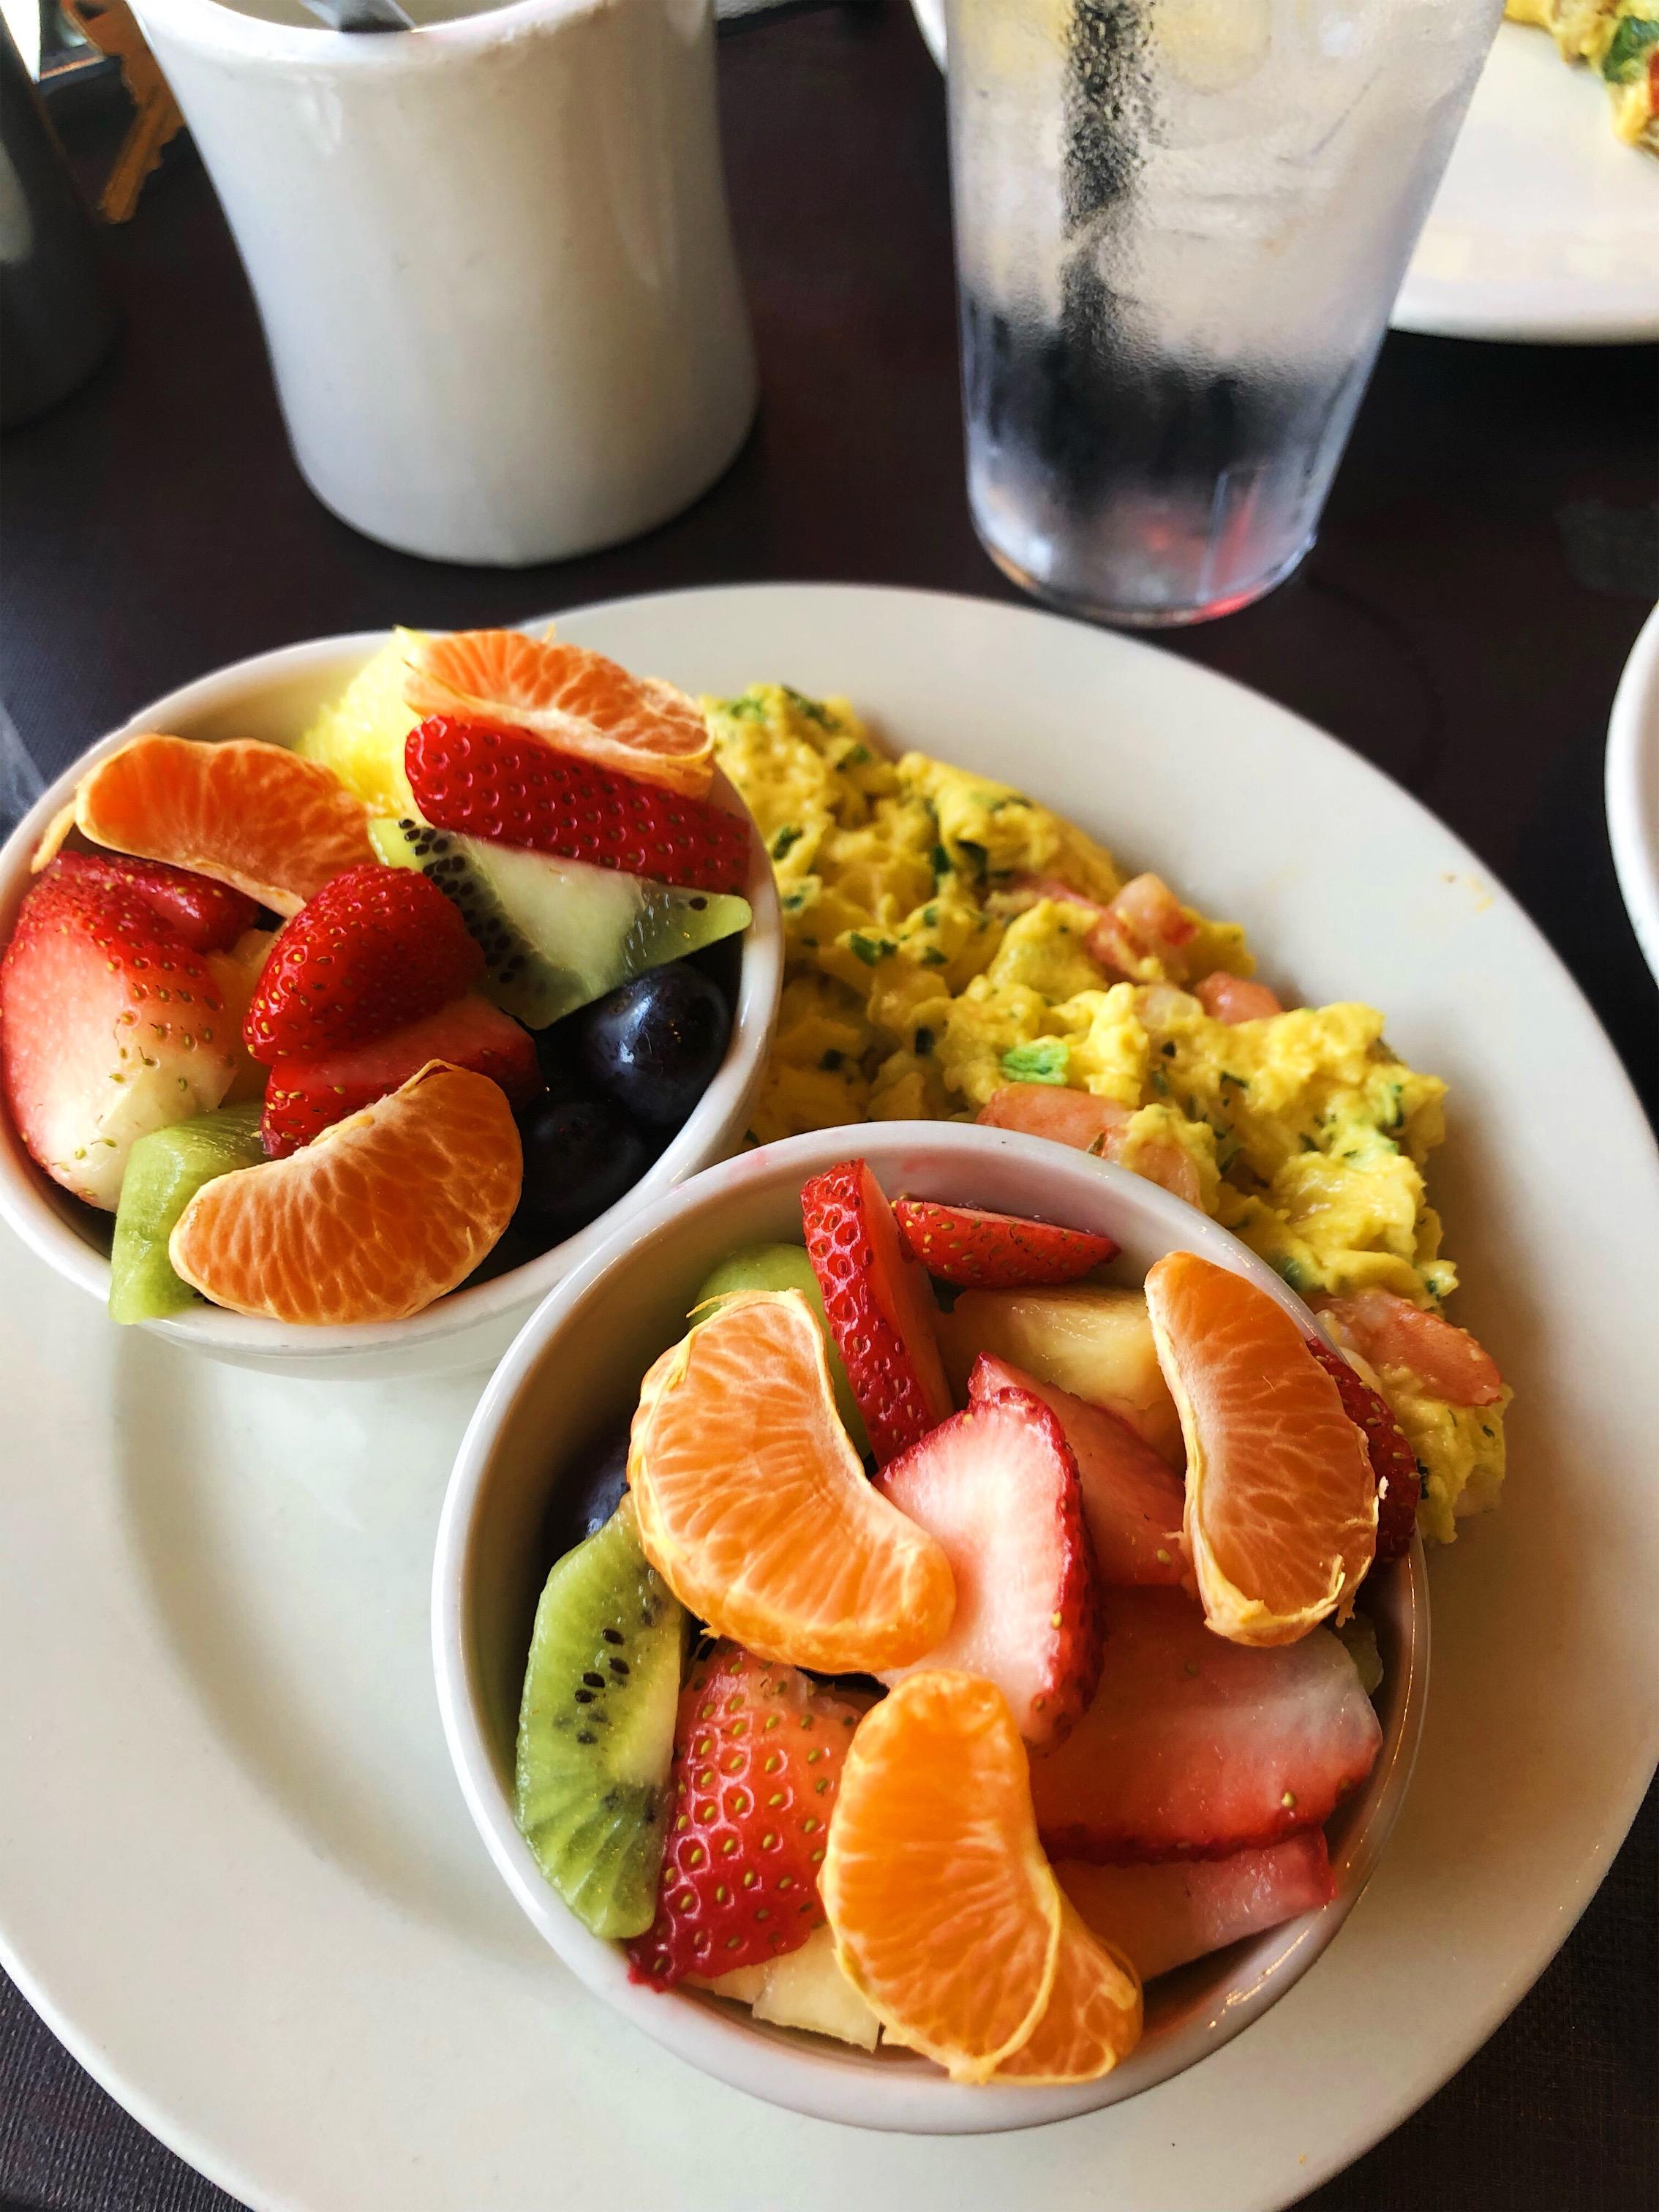 food weight loss exploring self